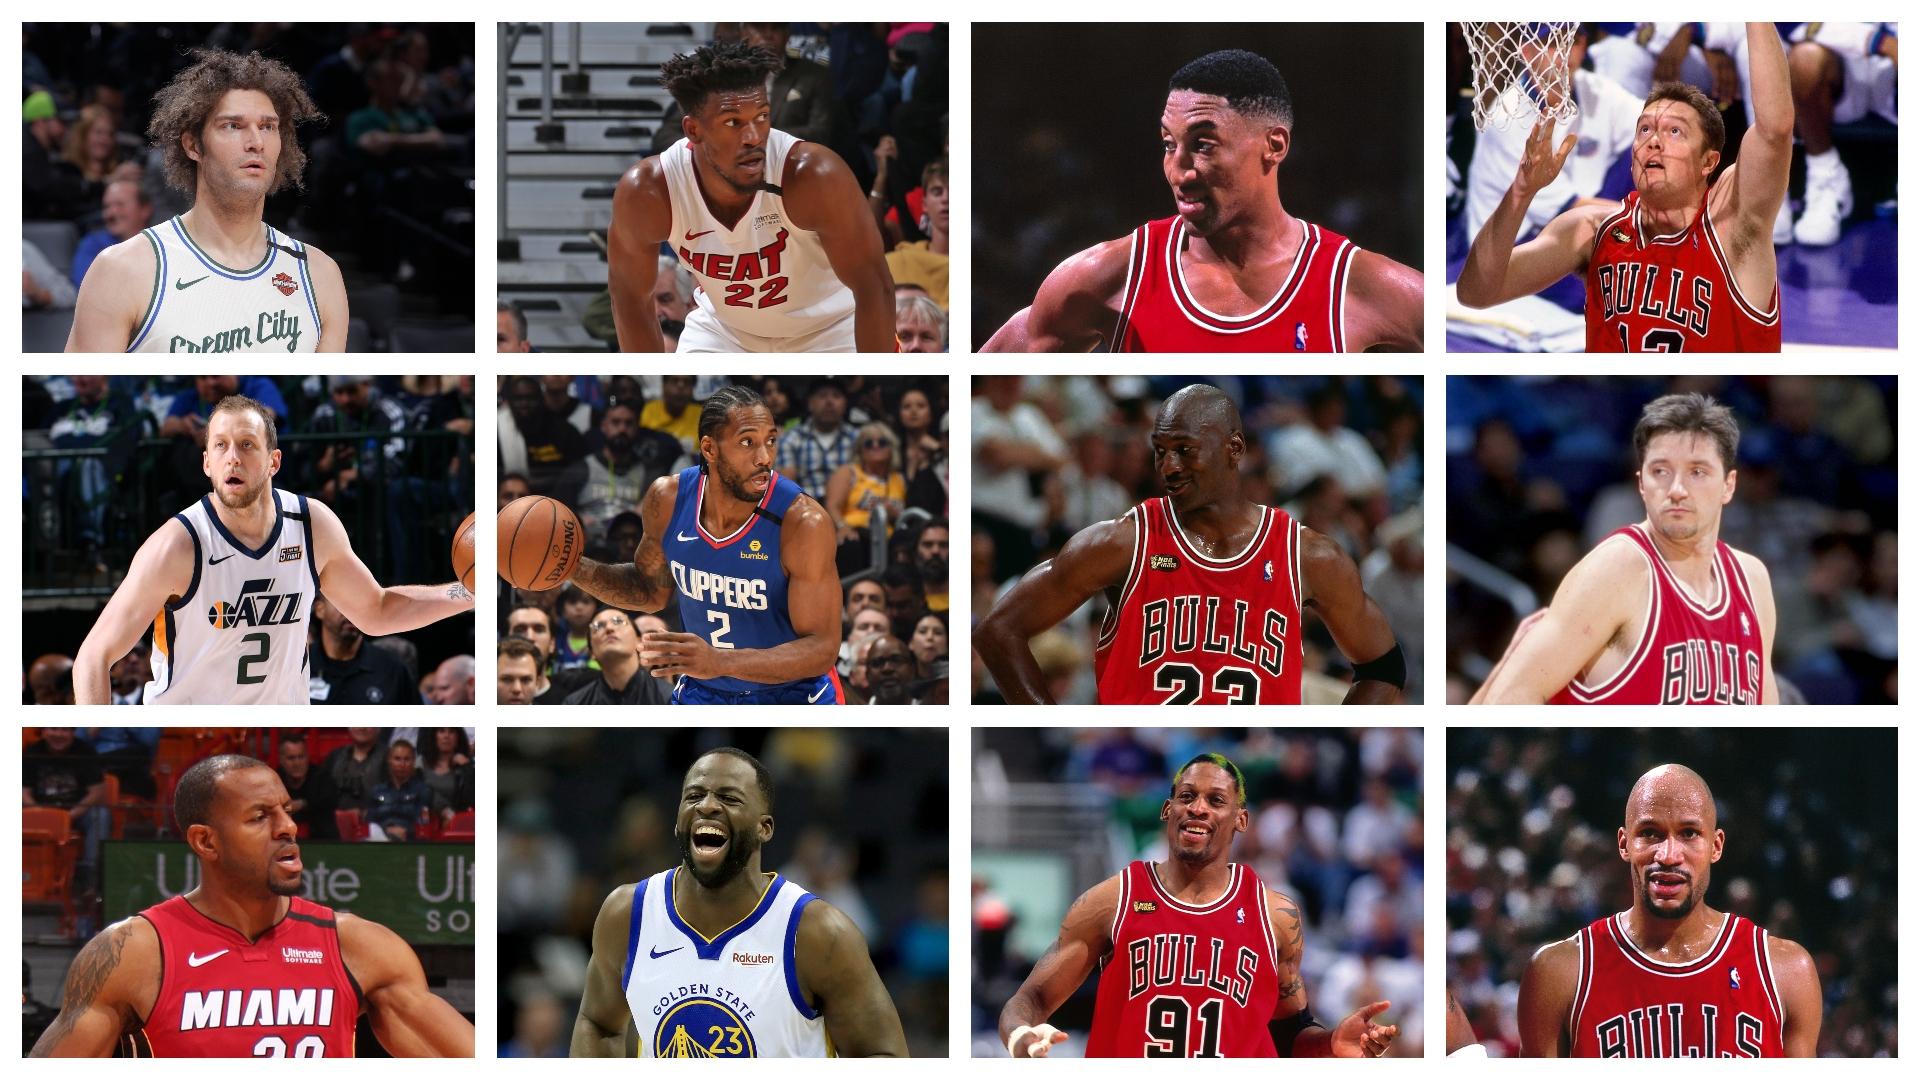 last dance 1997-98 Chicago Bulls